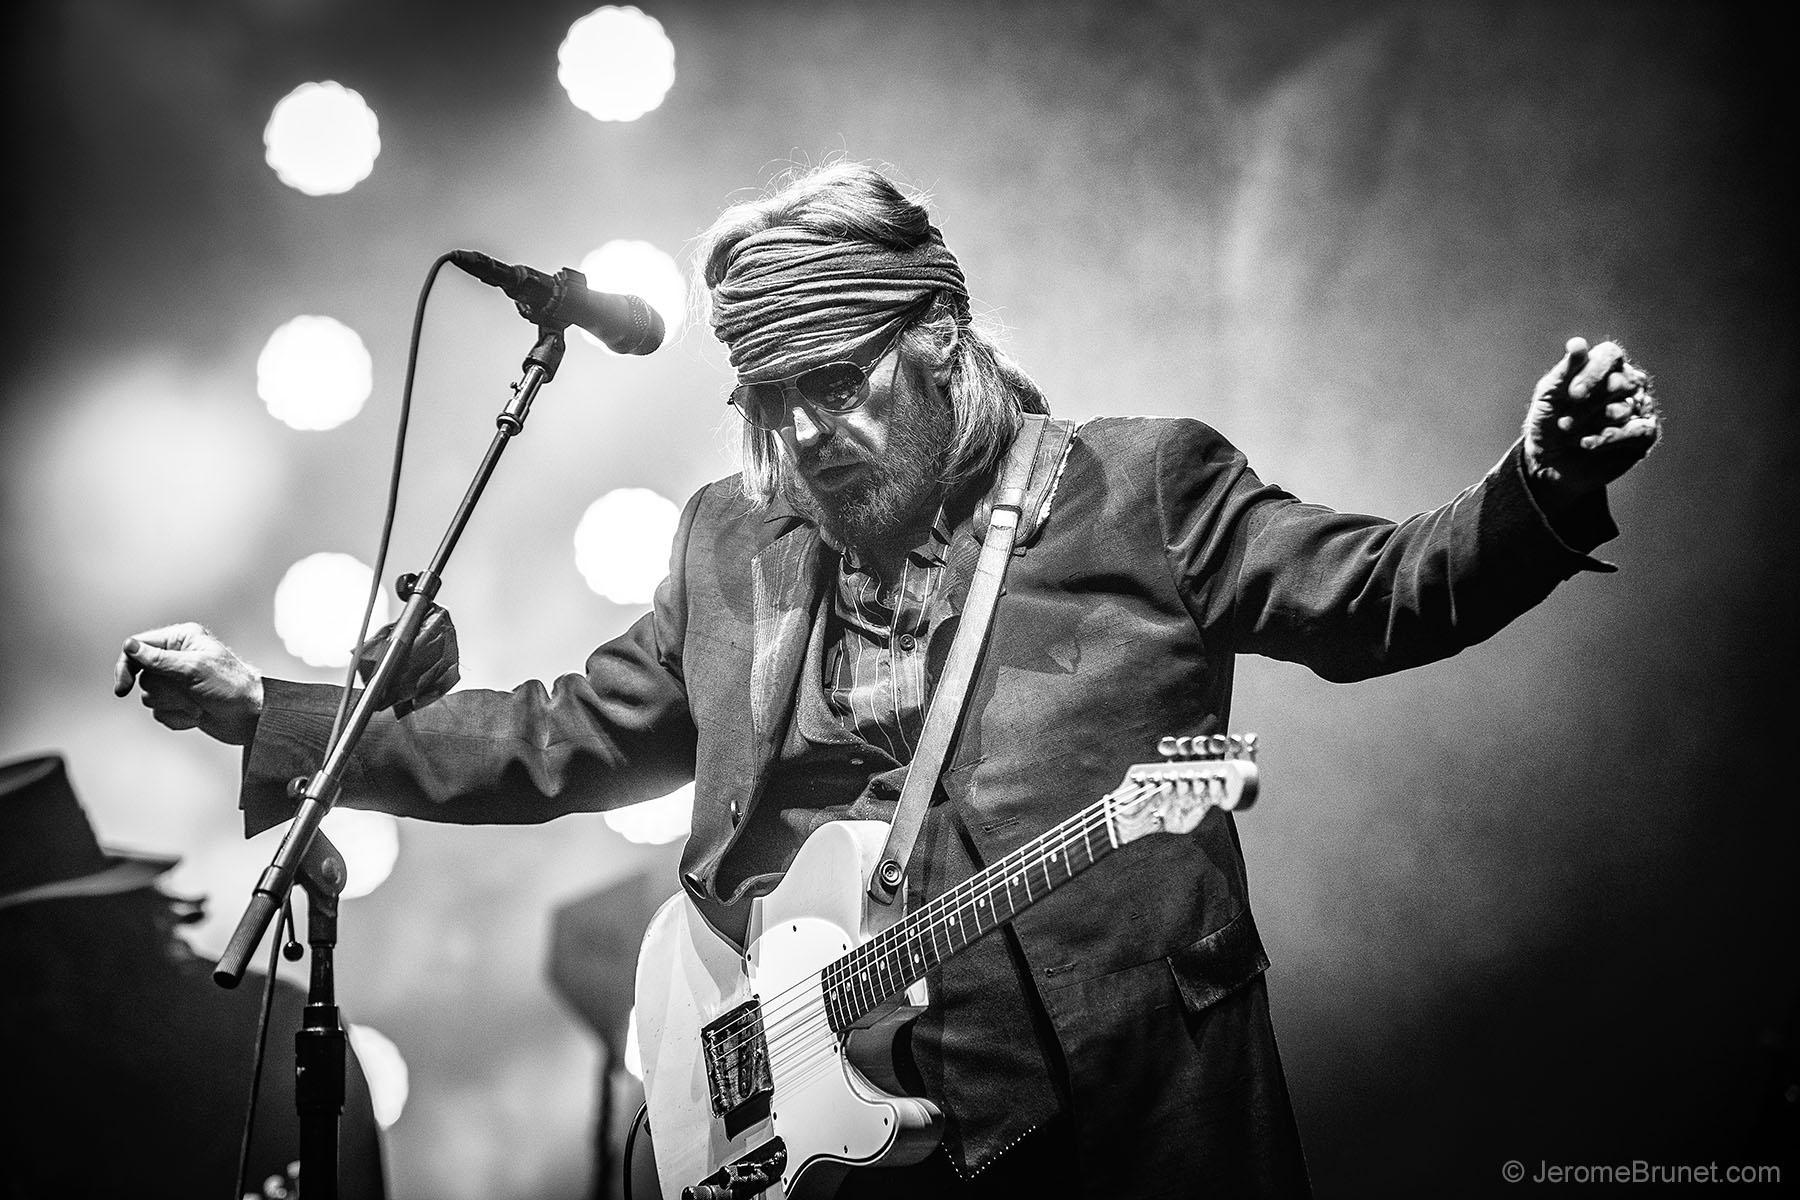 Tom Petty @ BottleRock Napa Valley, 2017 ((Image: © Jerome Brunet)